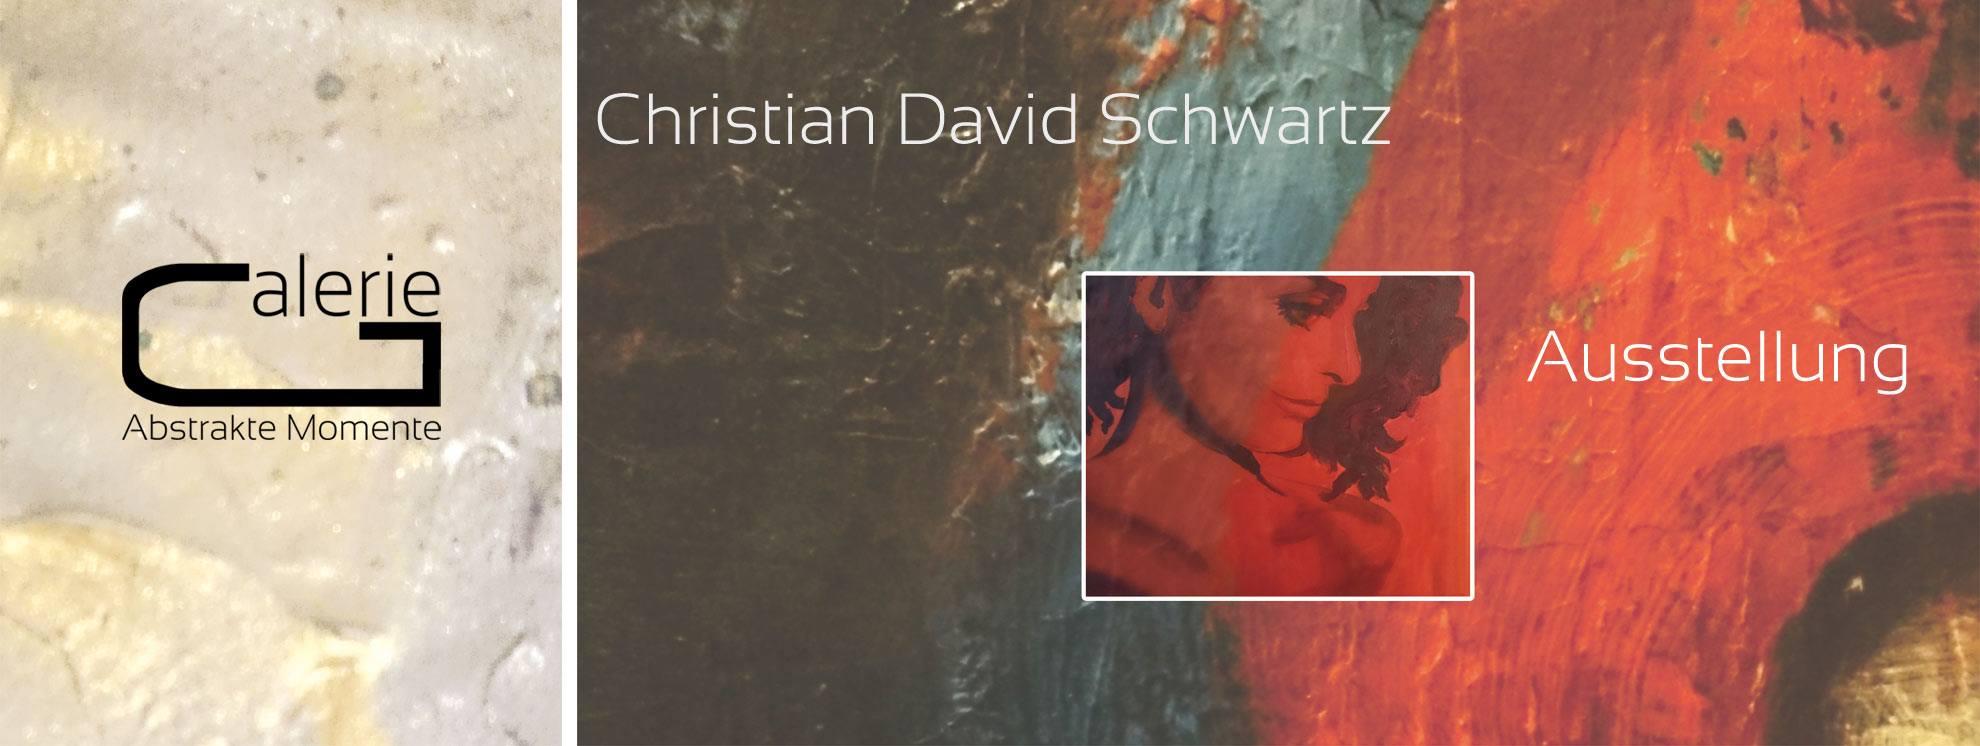 Christian David Schwartz Ausstellung